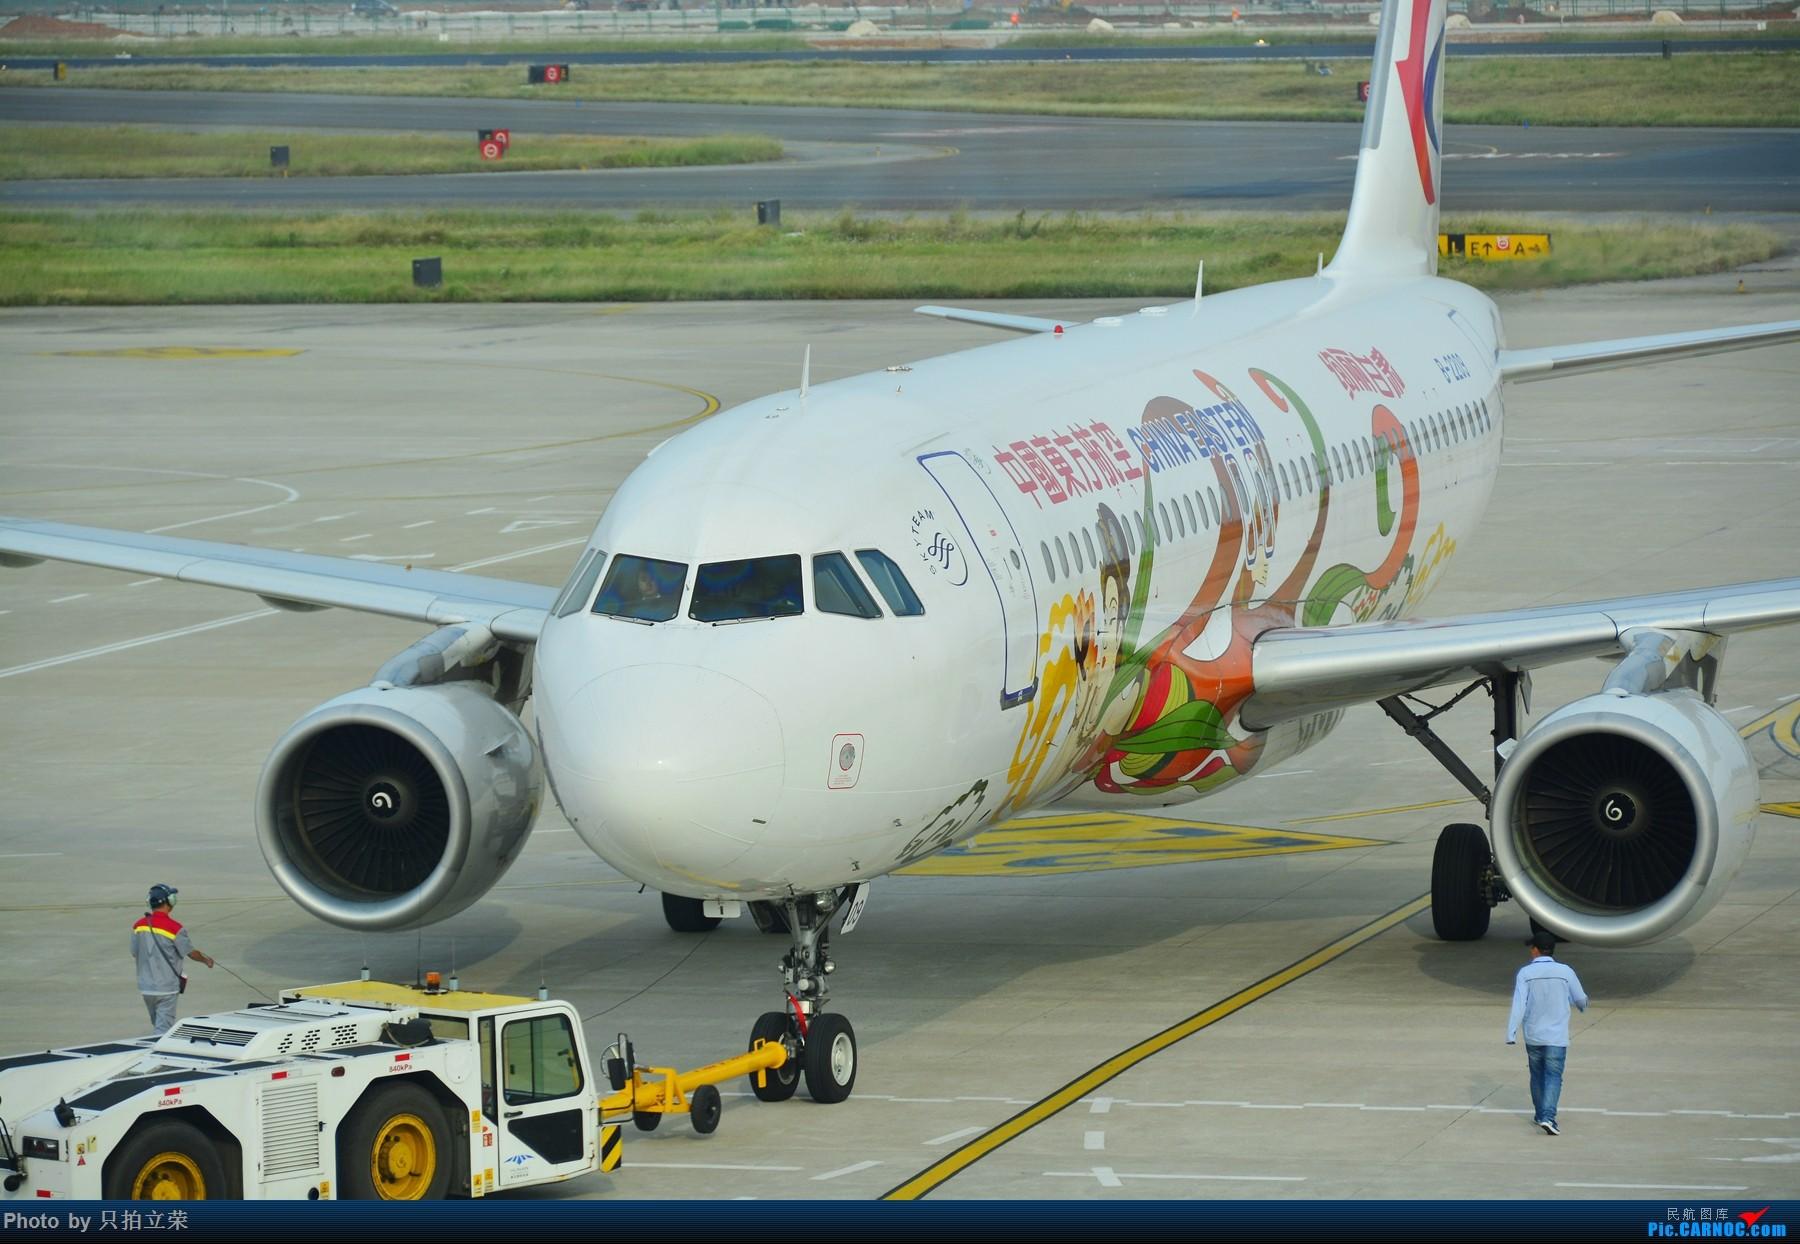 Re:[原创]湖南飞友会之10月9日长沙黄花好货满天飞! AIRBUS A320-200 B-2209 中国长沙黄花国际机场